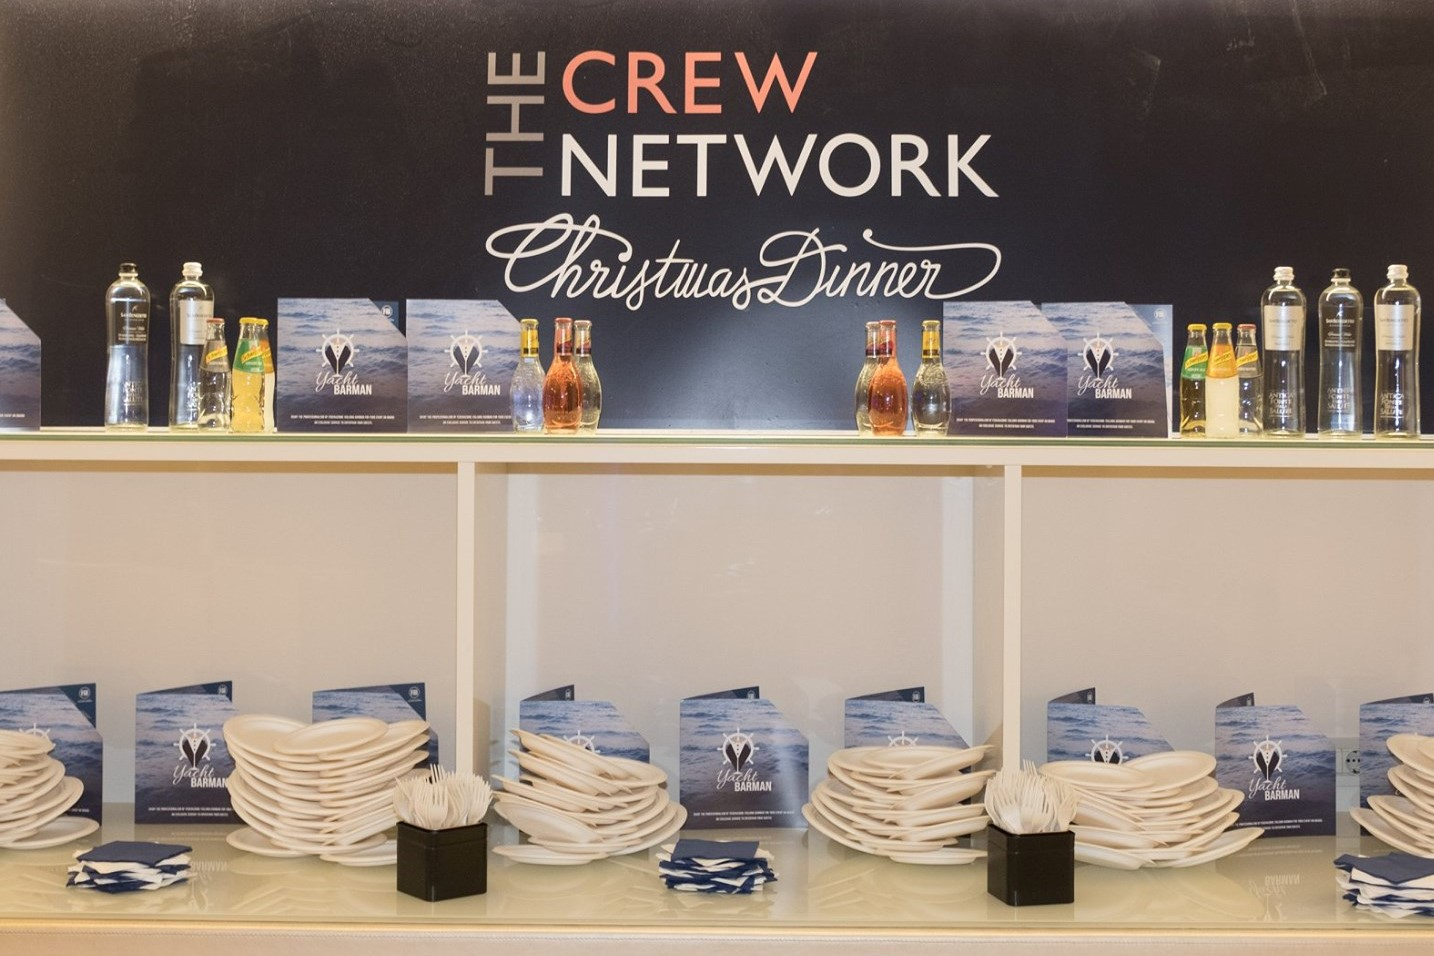 FIB alla The Crew Network Christmas Dinner 2019